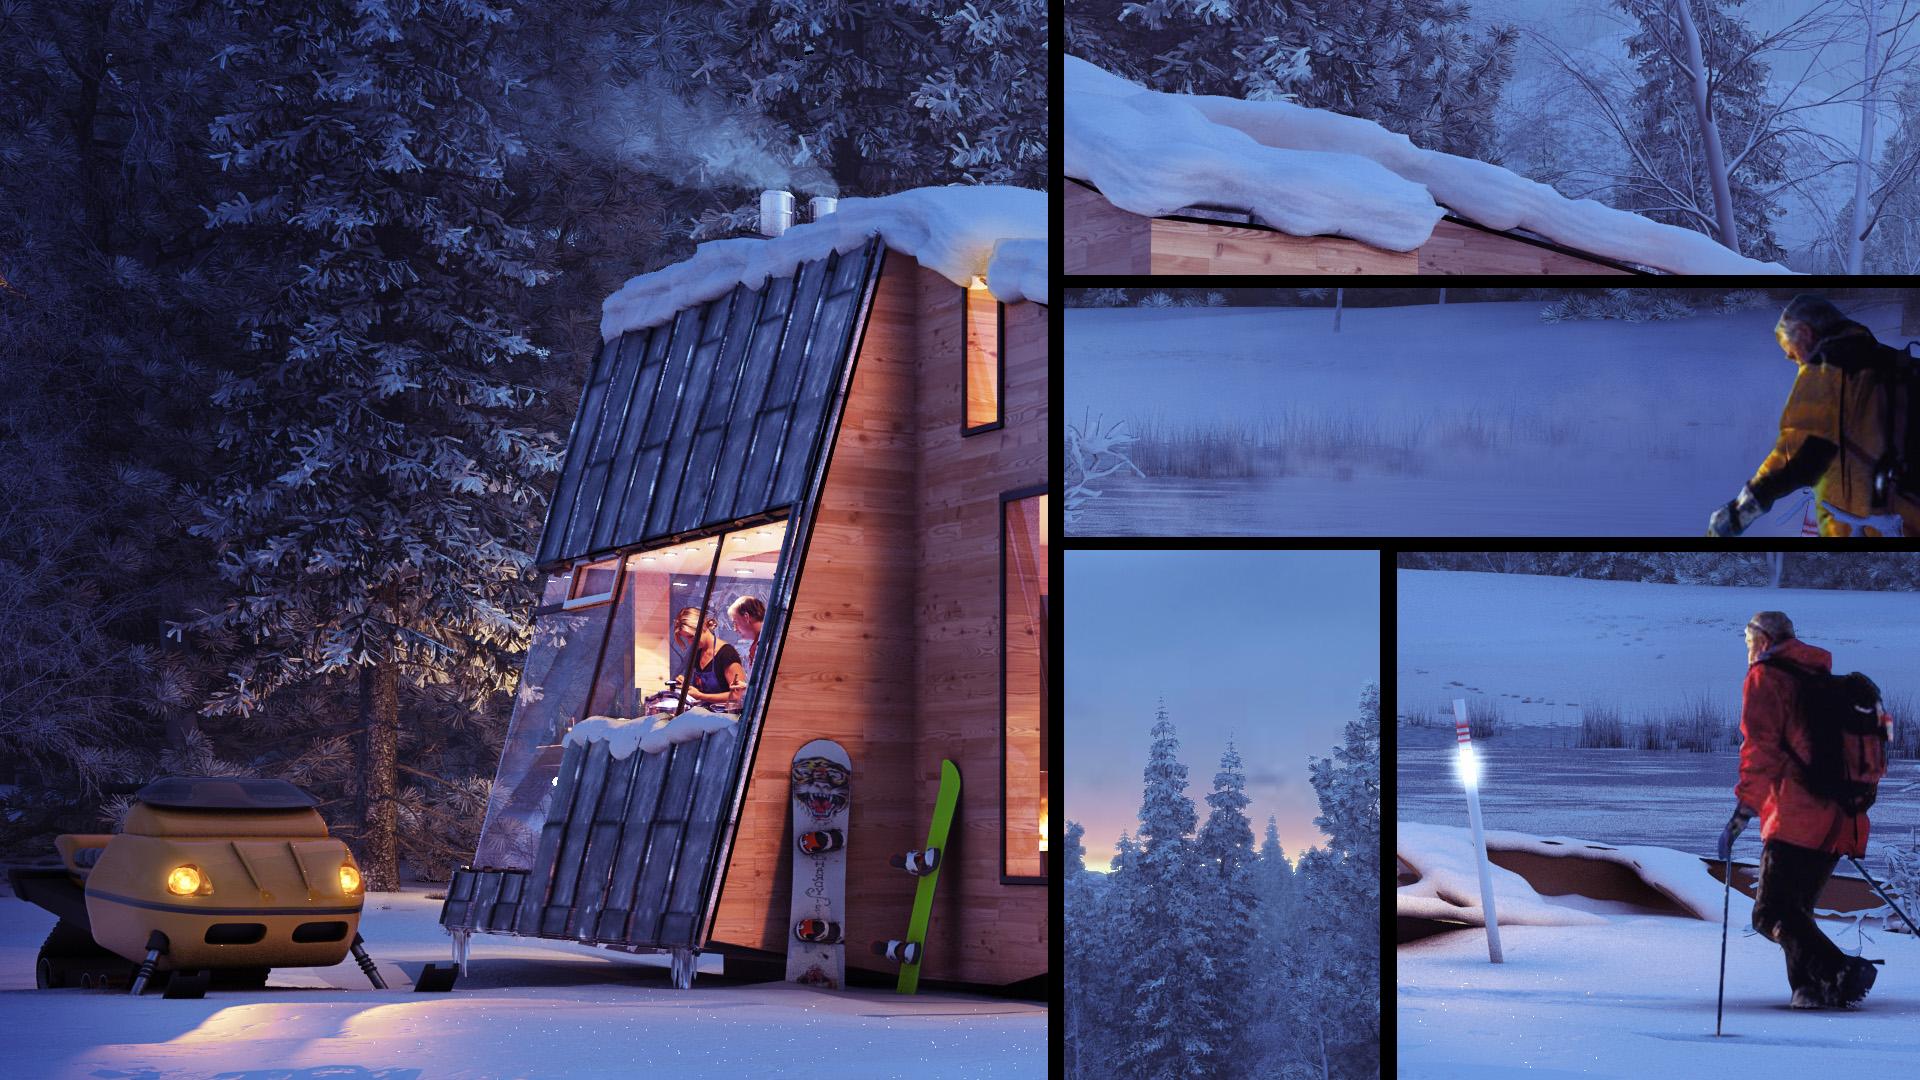 winter cottage details